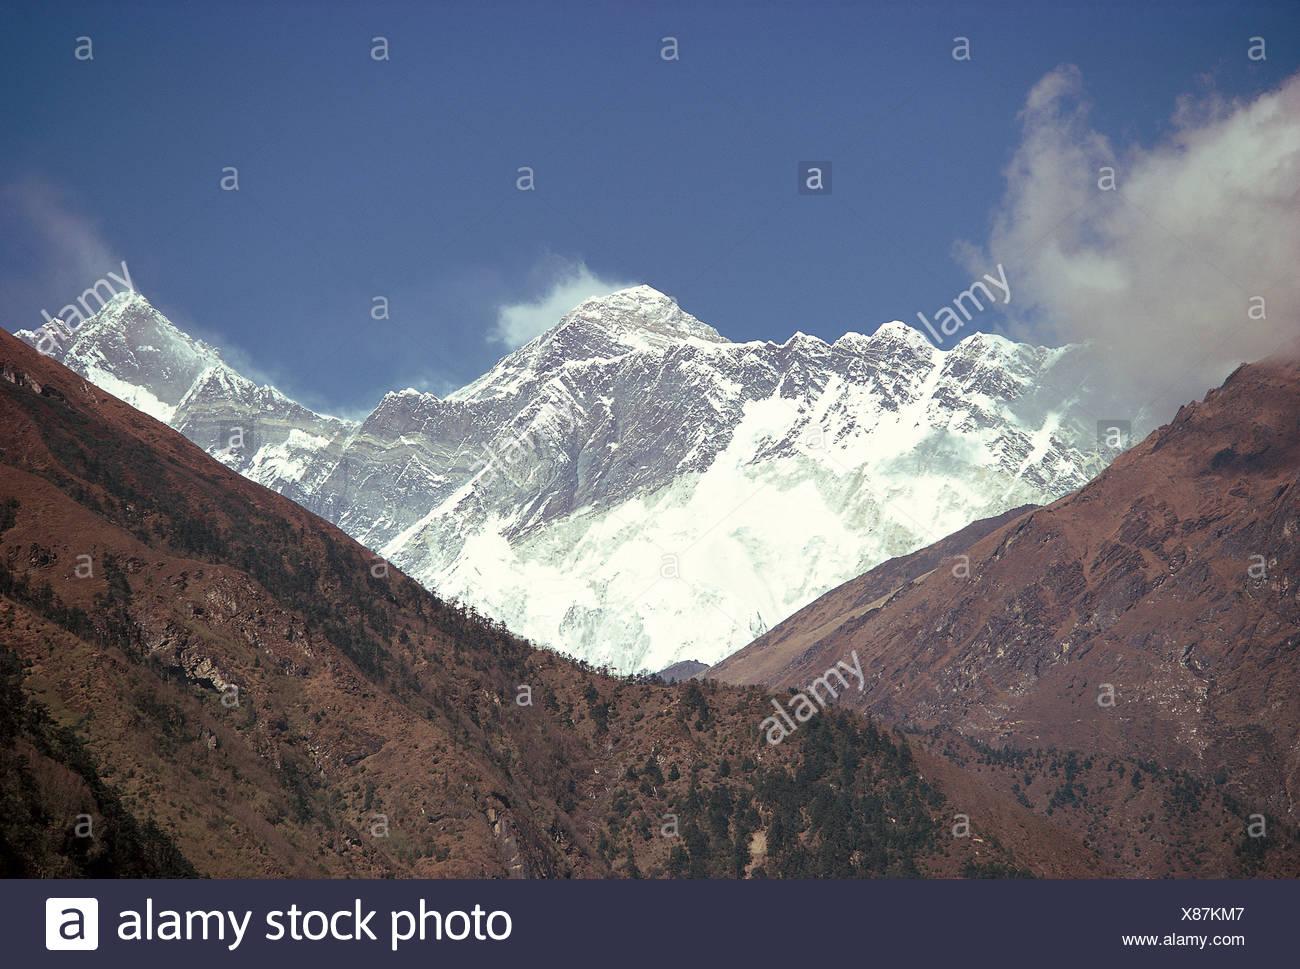 Mount Everest - Stock Image